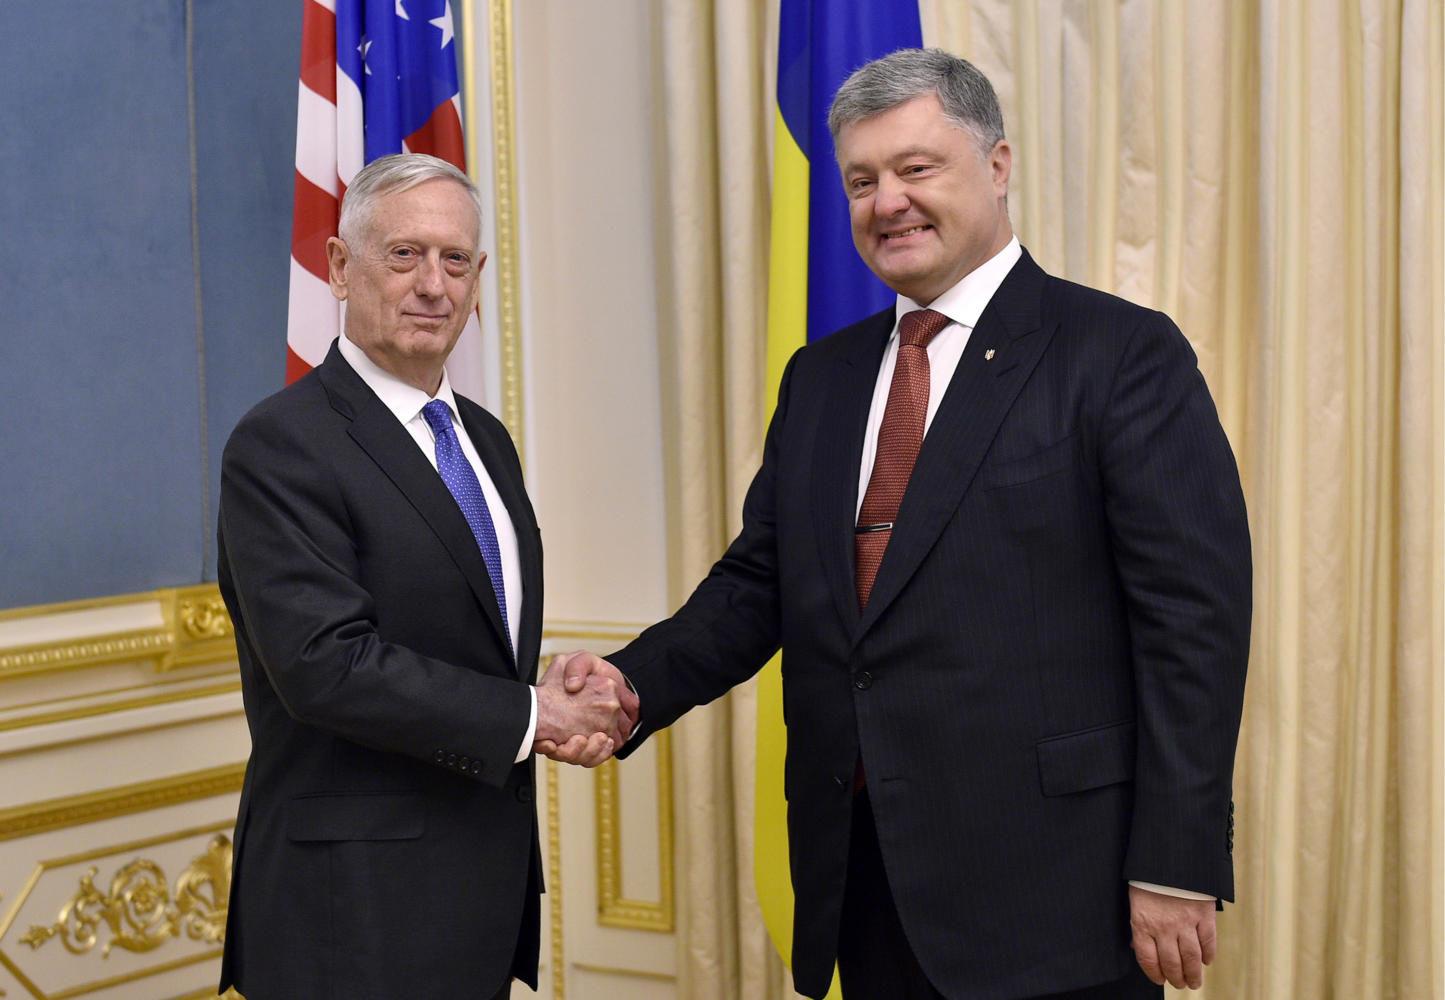 US+Secretary+of+Defence+James+Mattis%2C+left%2C+and+Ukraine%27s+President+Petro+Poroshenko+shake+hands+during+a+meeting+in+Kiev+on+Aug.+24%2C+2017.+%28Lazarenko+Mykola%2FTASS%2FZuma+Press%2FTNS%29